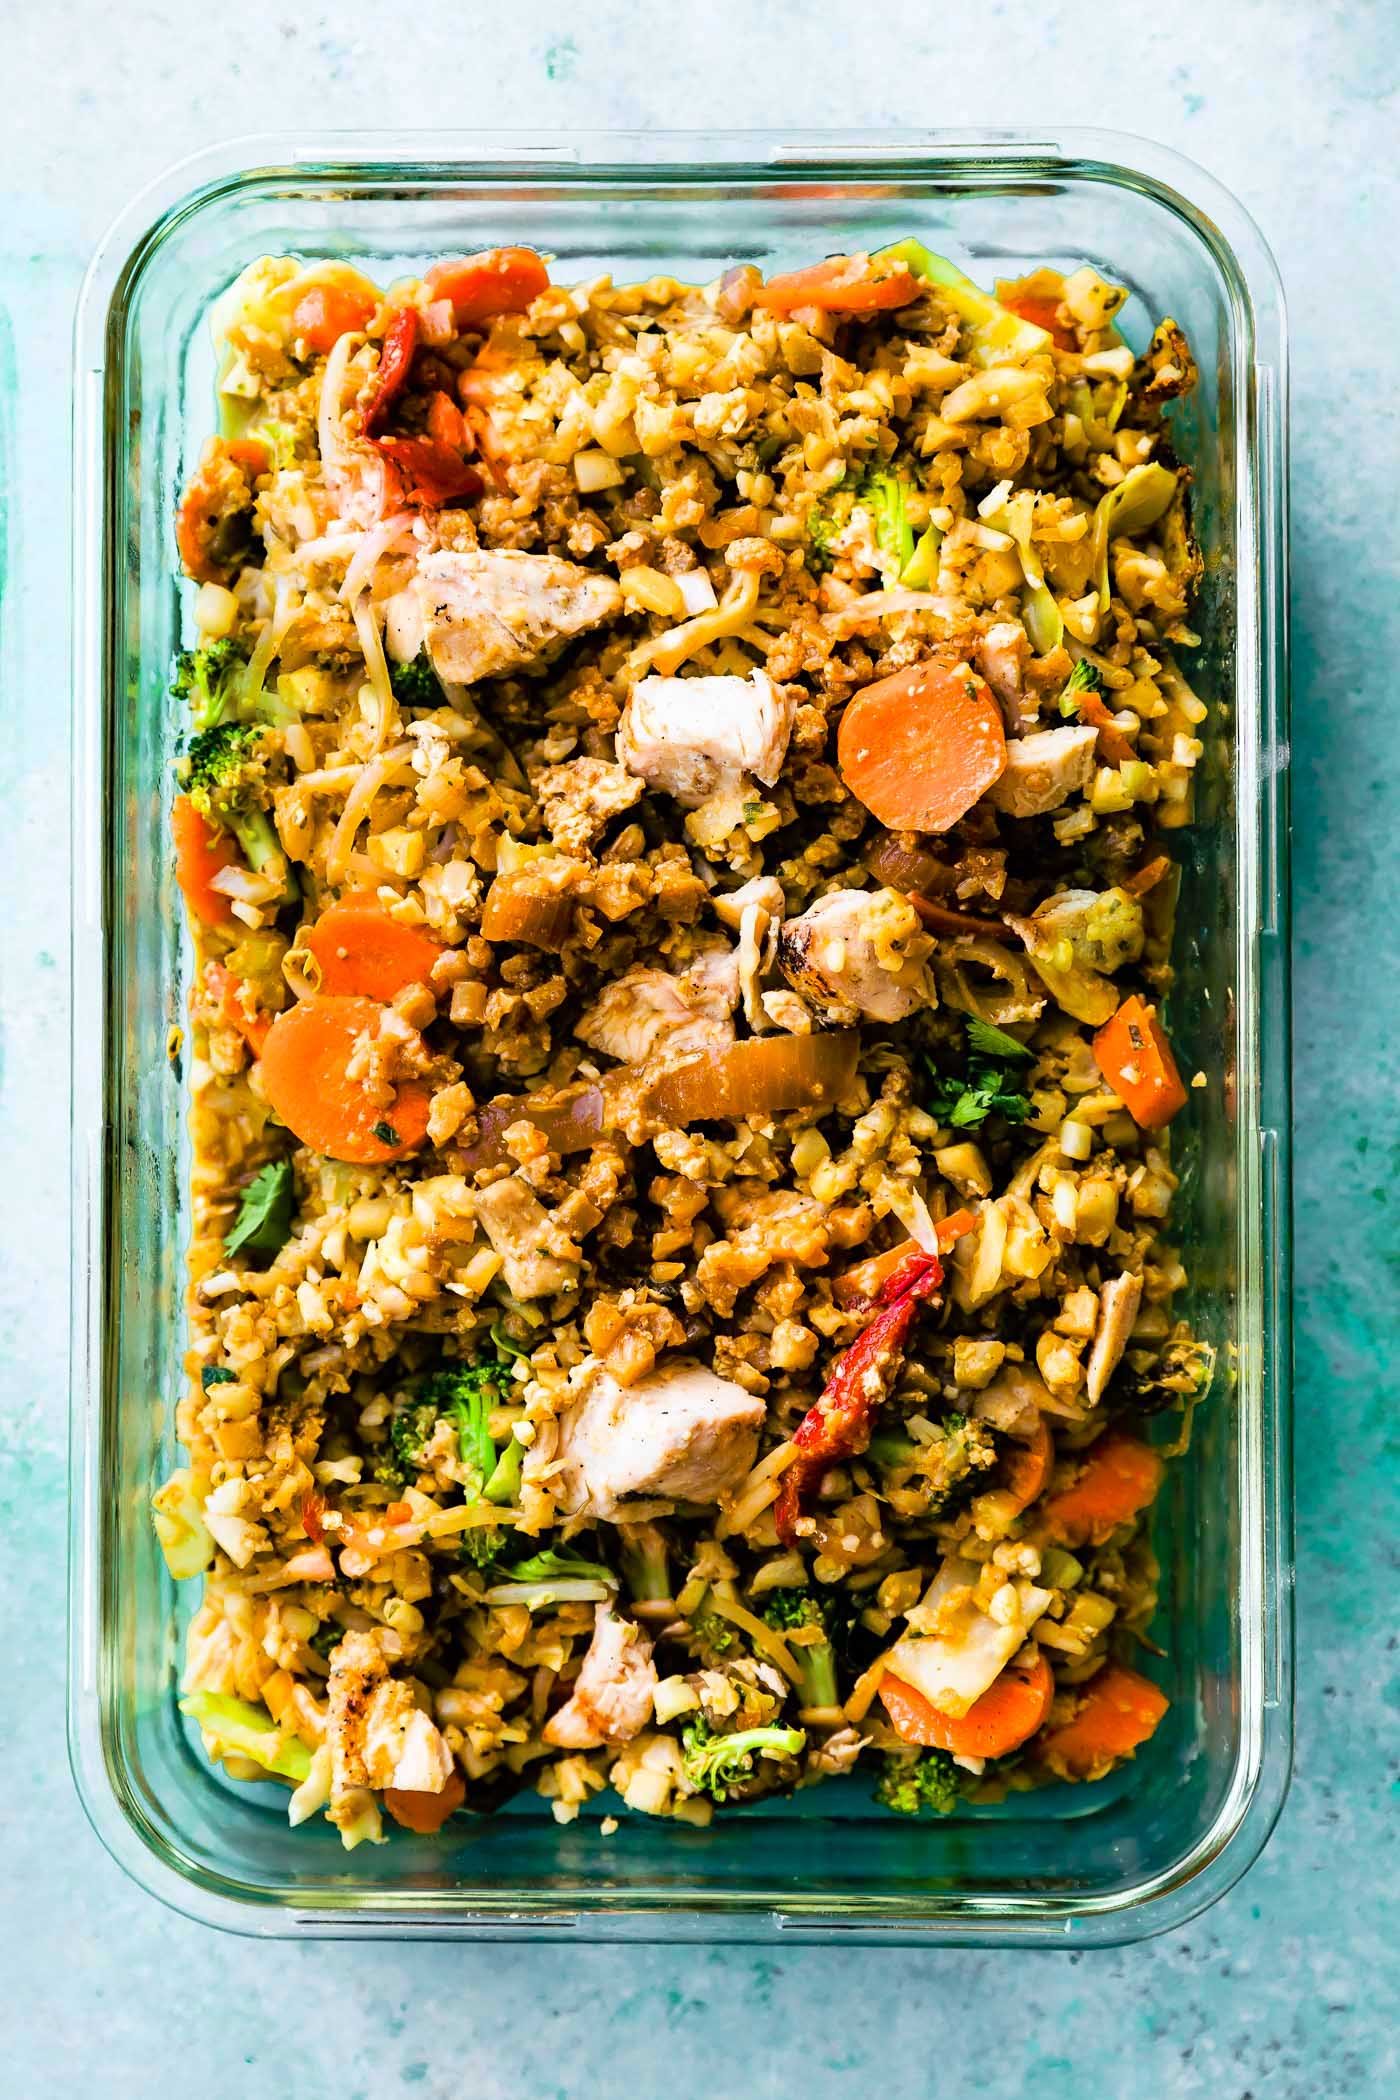 cauliflower rice and veggies in casserole